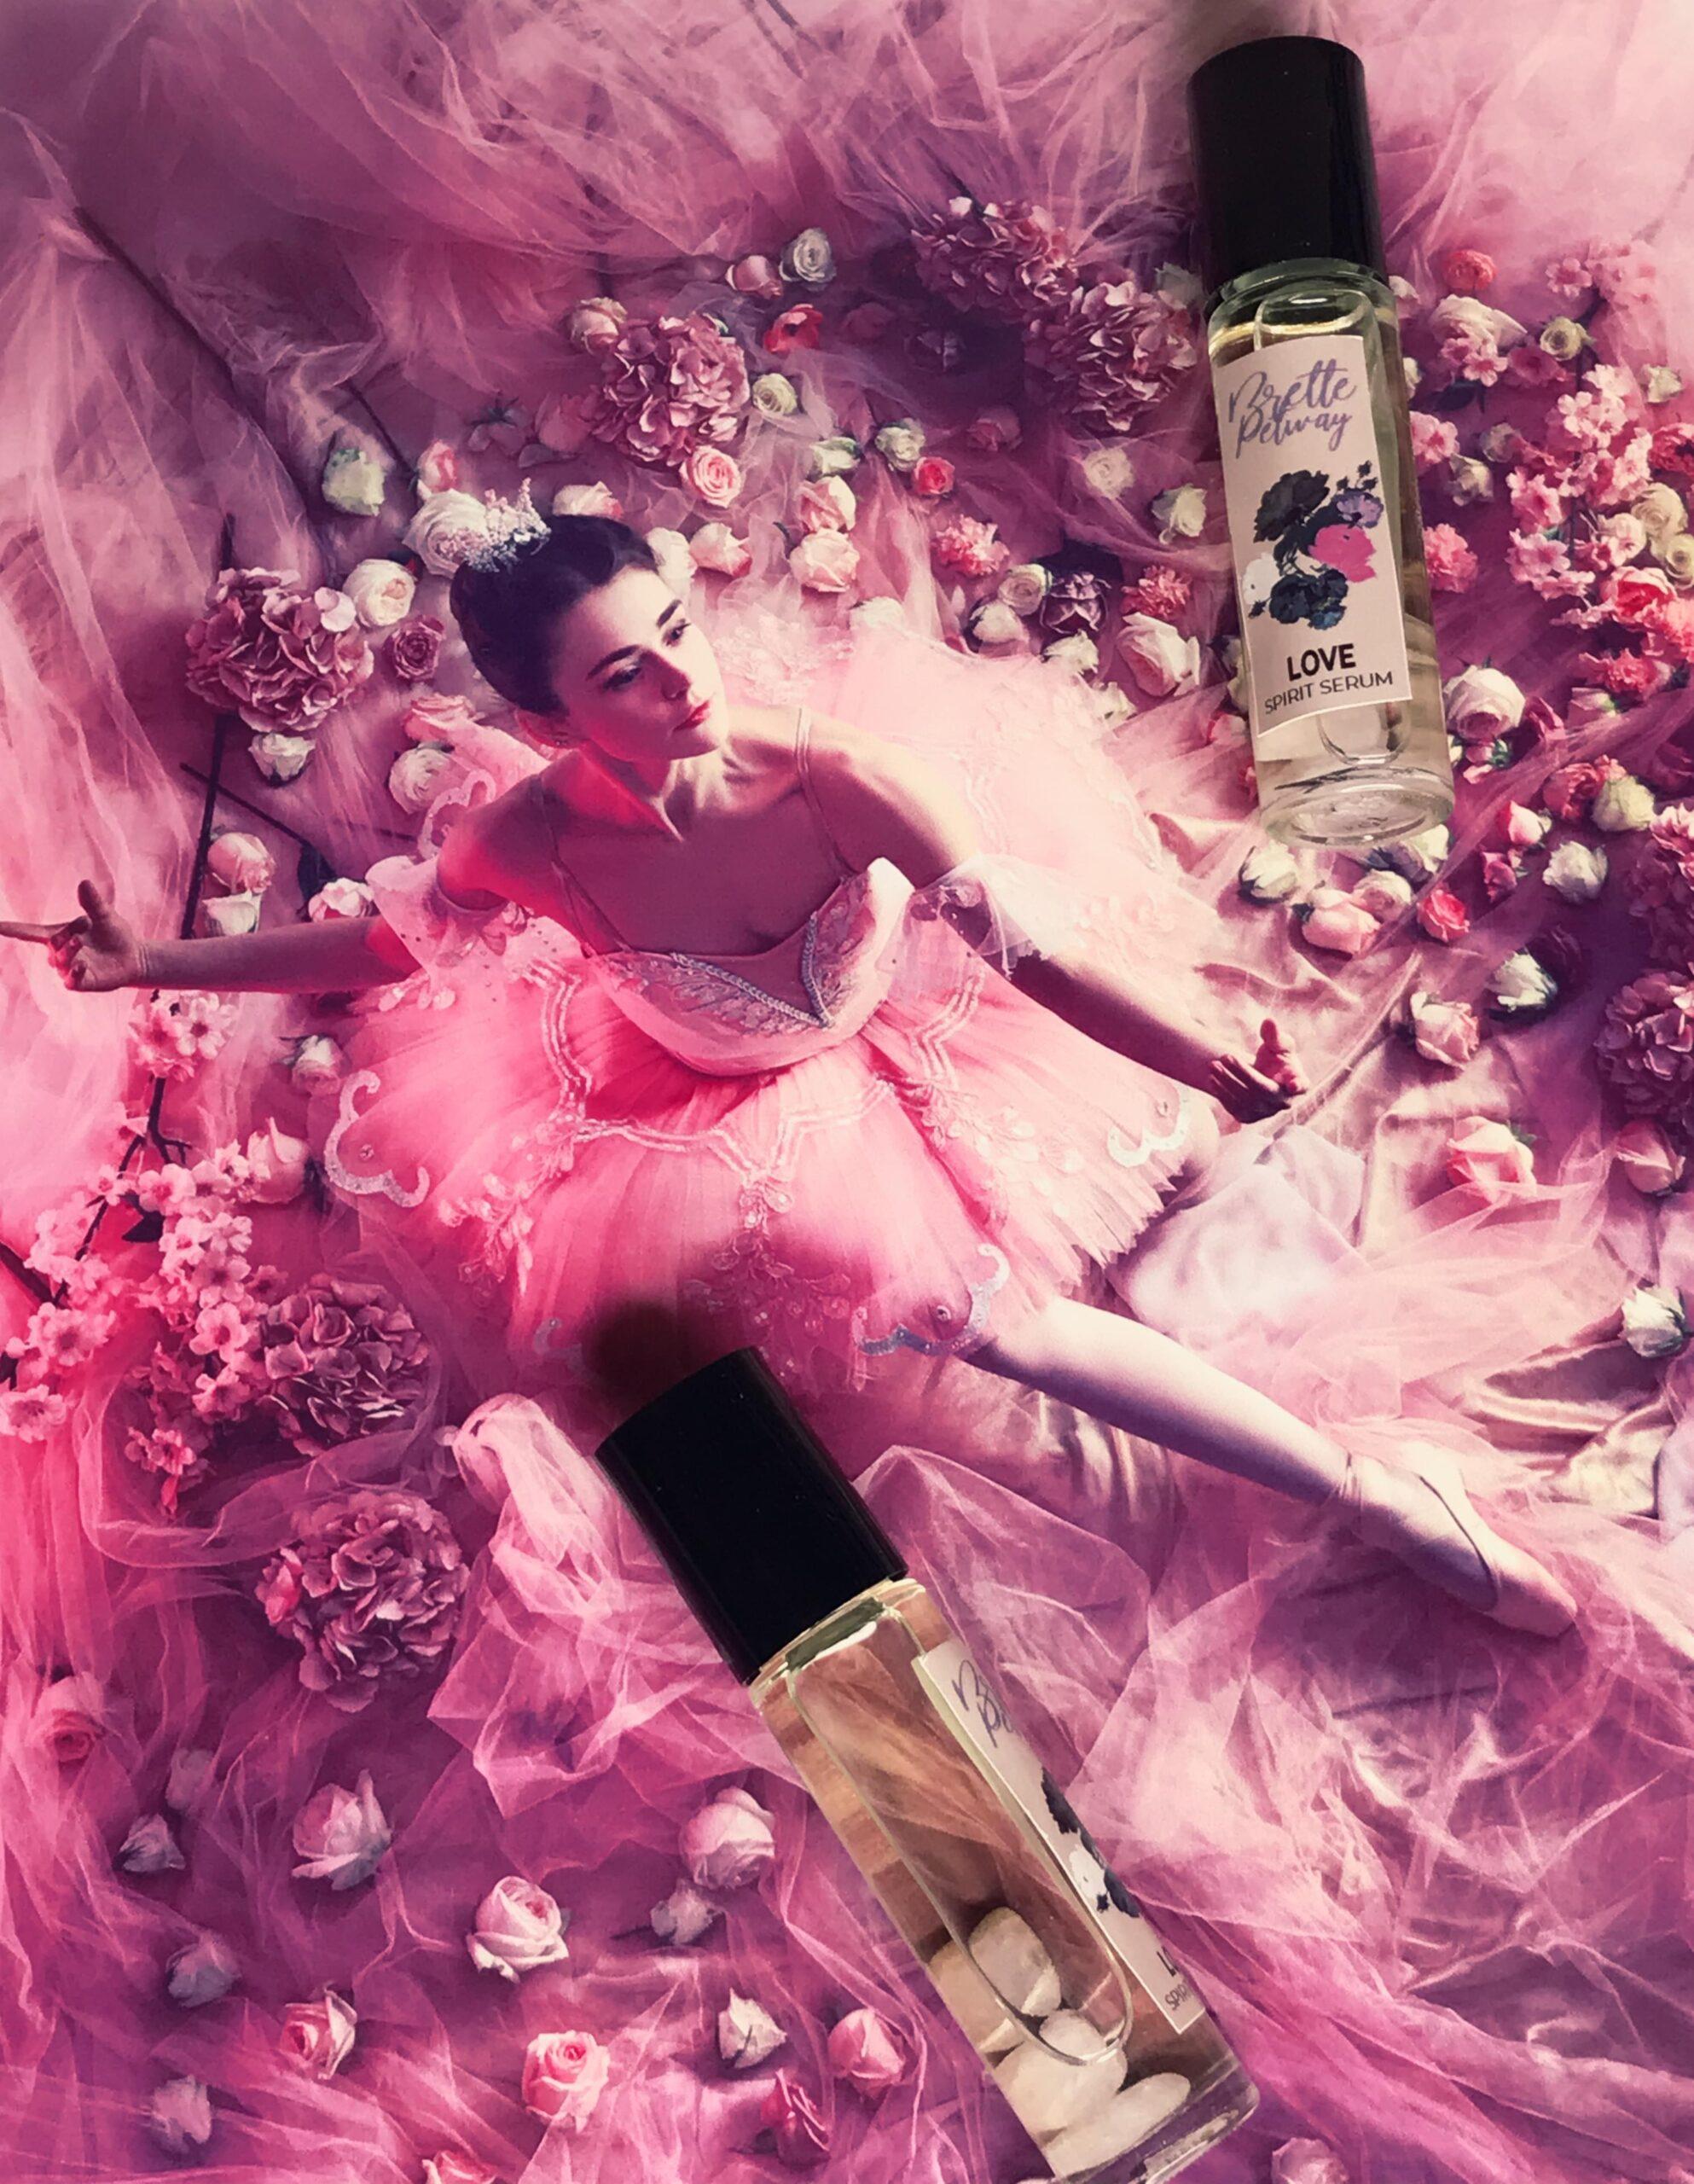 Aromatherapy_perfume_oil_Love_crystals_12.min